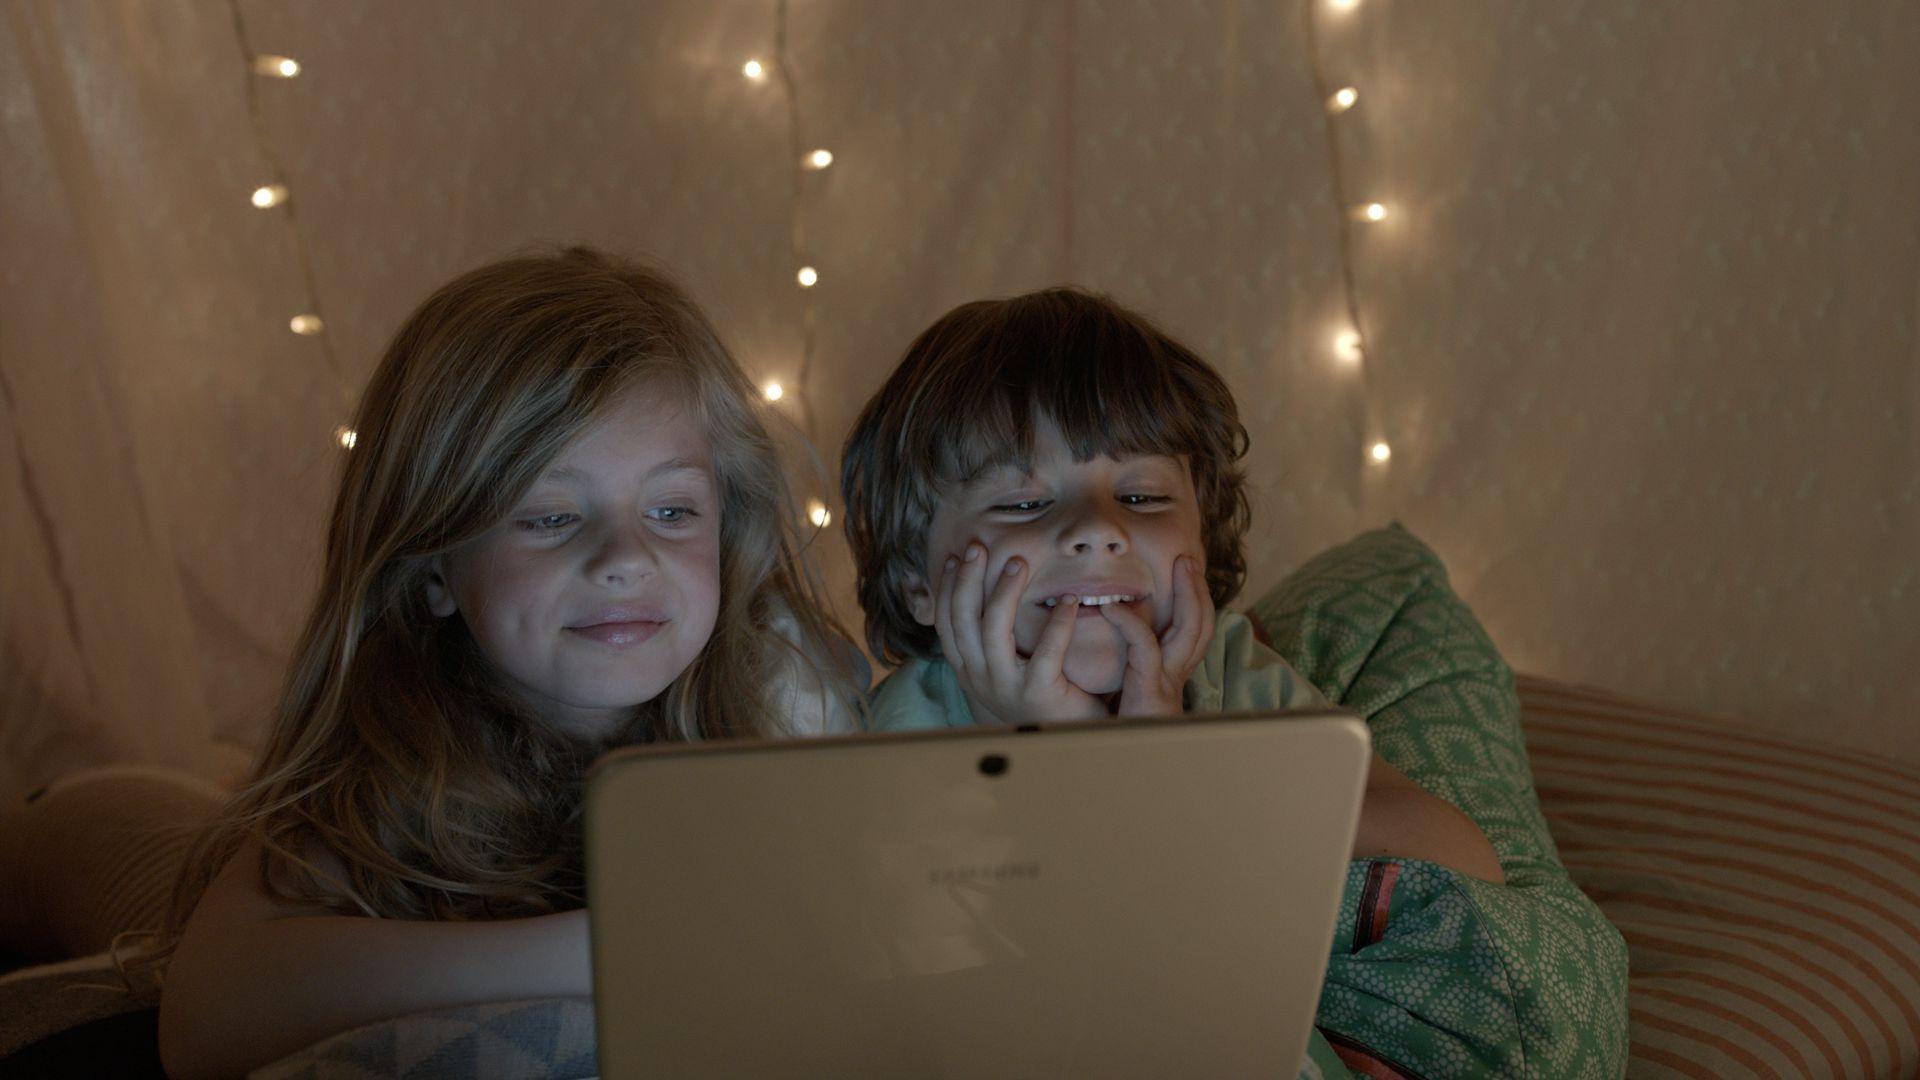 YouSee Streaming børn